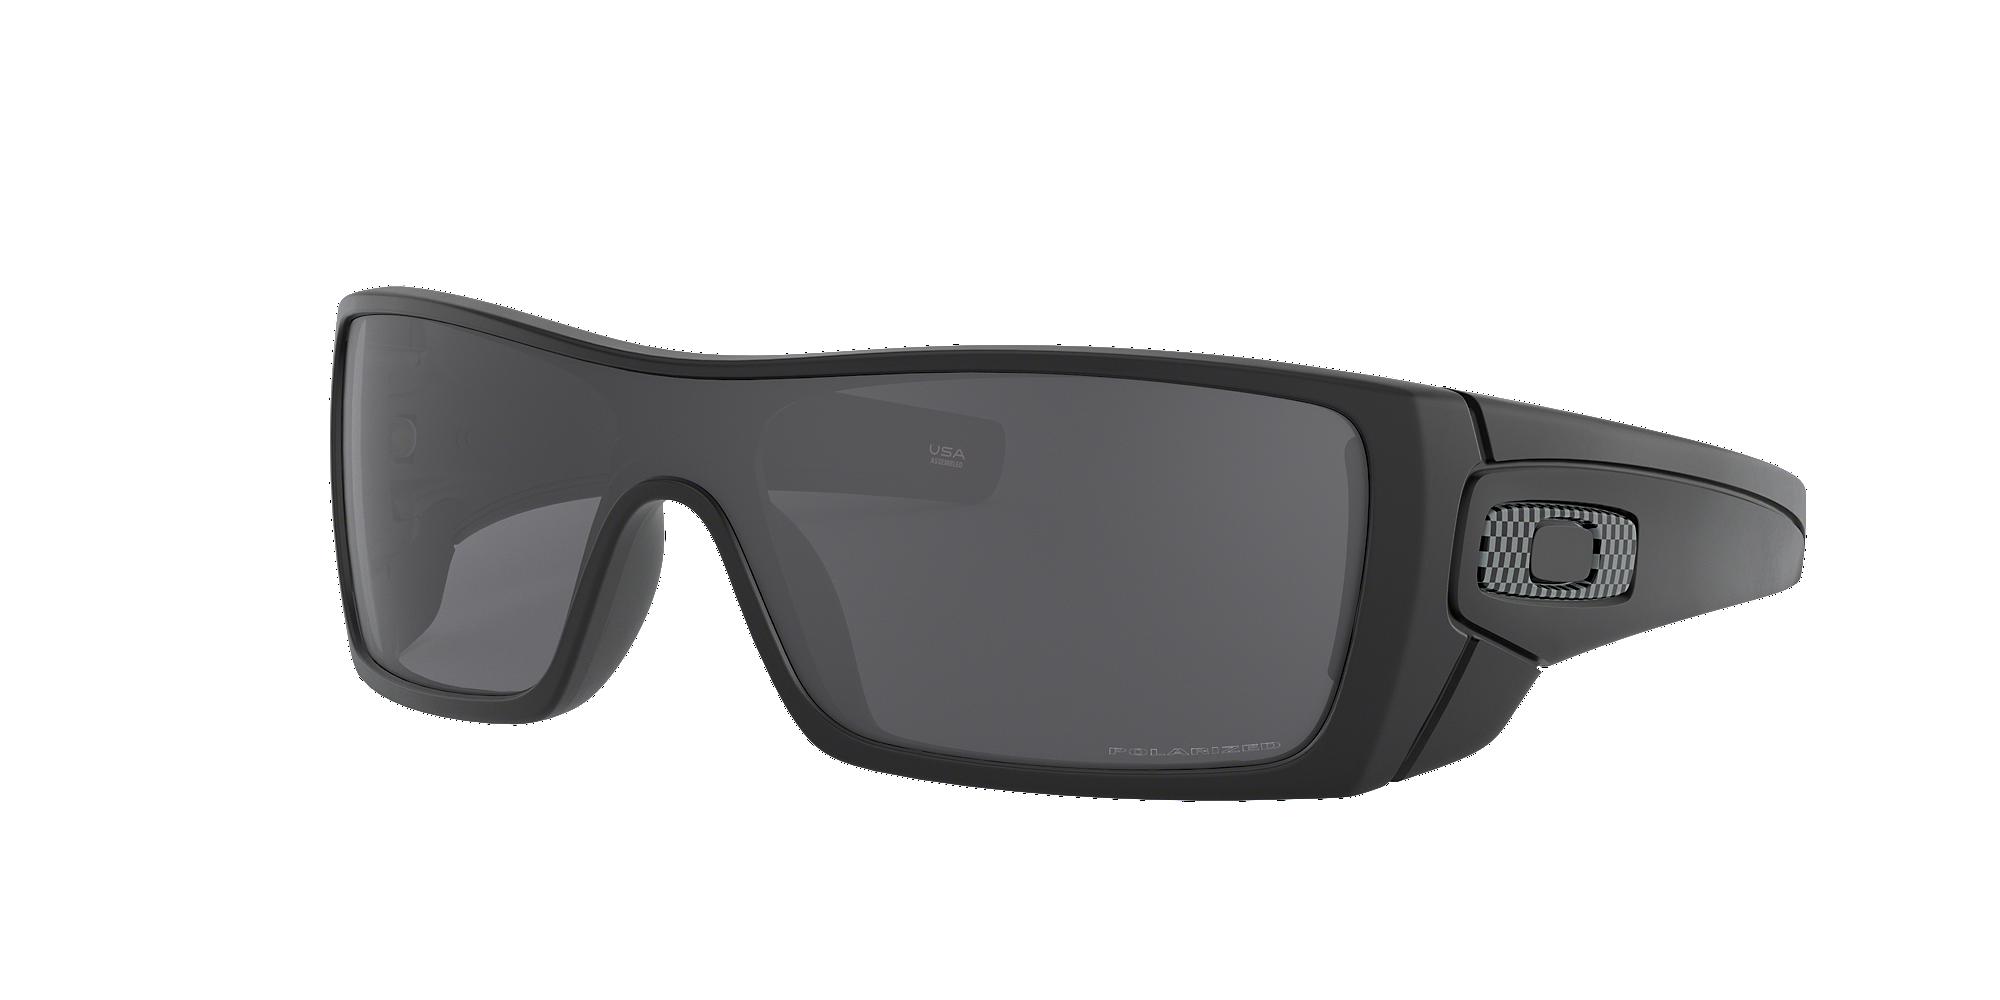 Oakley Safety Glasses Australia